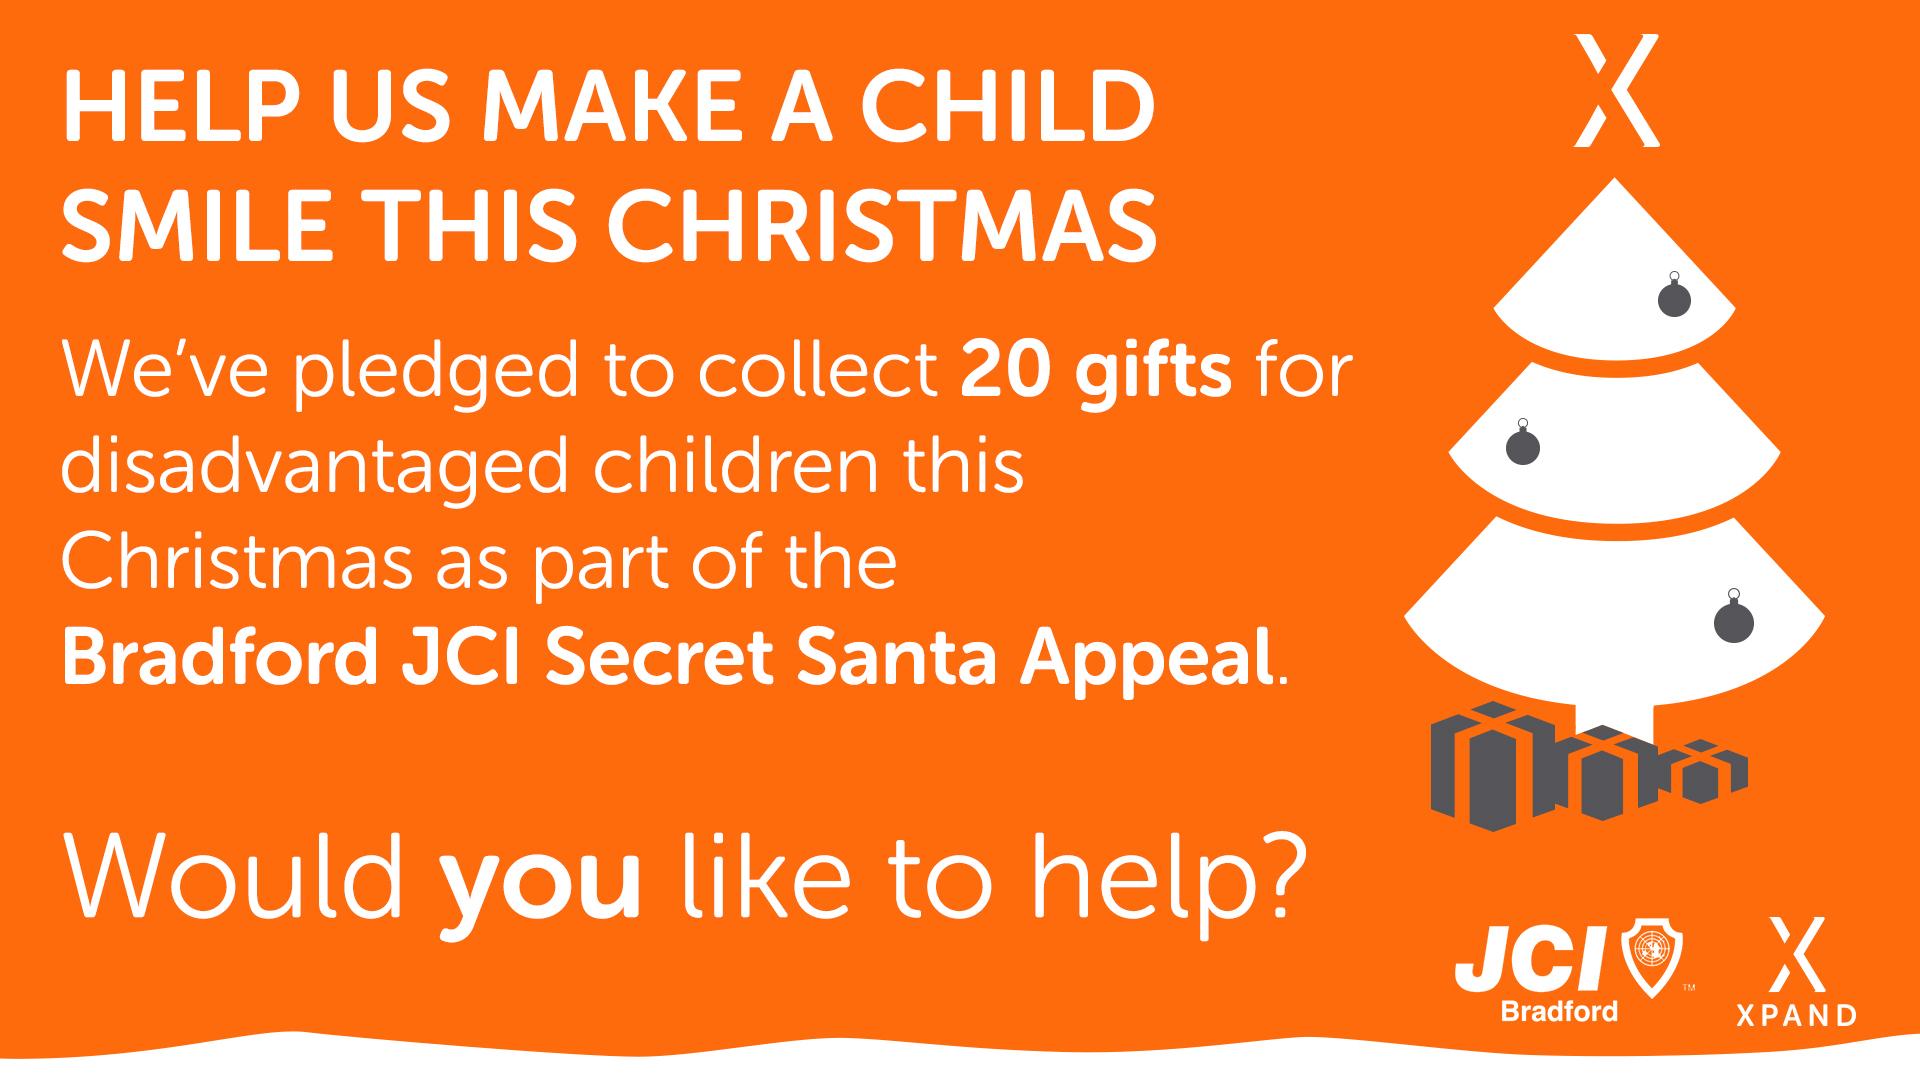 JCI Secret Santa